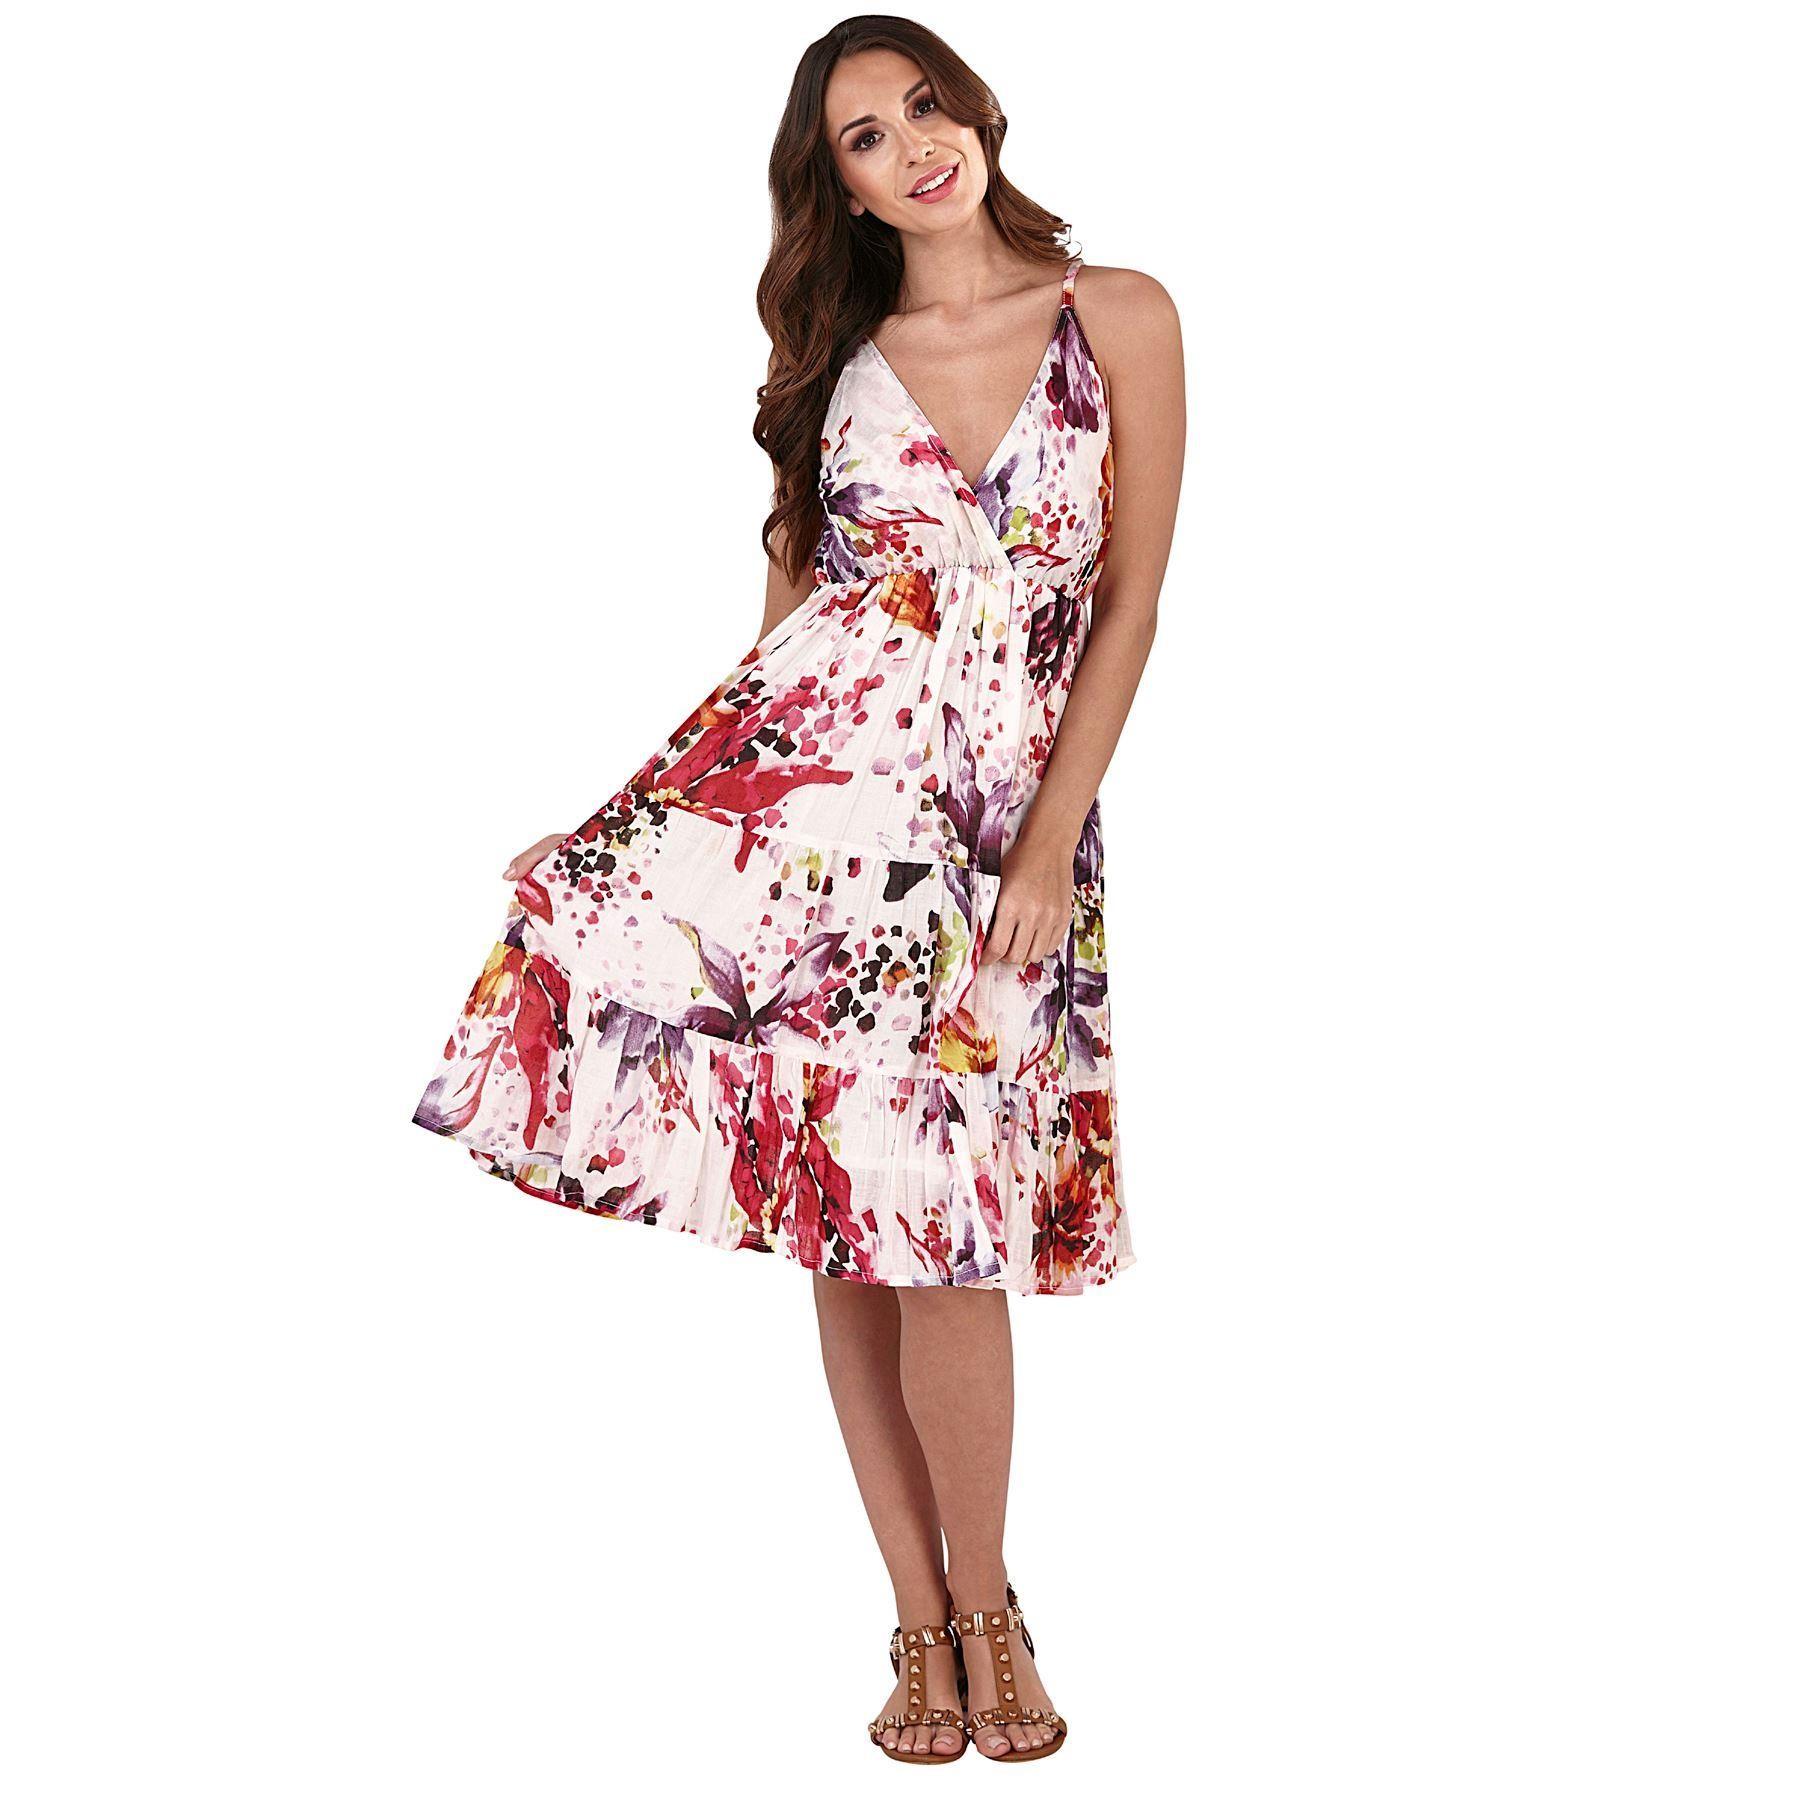 Pistachio Floral Print Crossover Dress - White